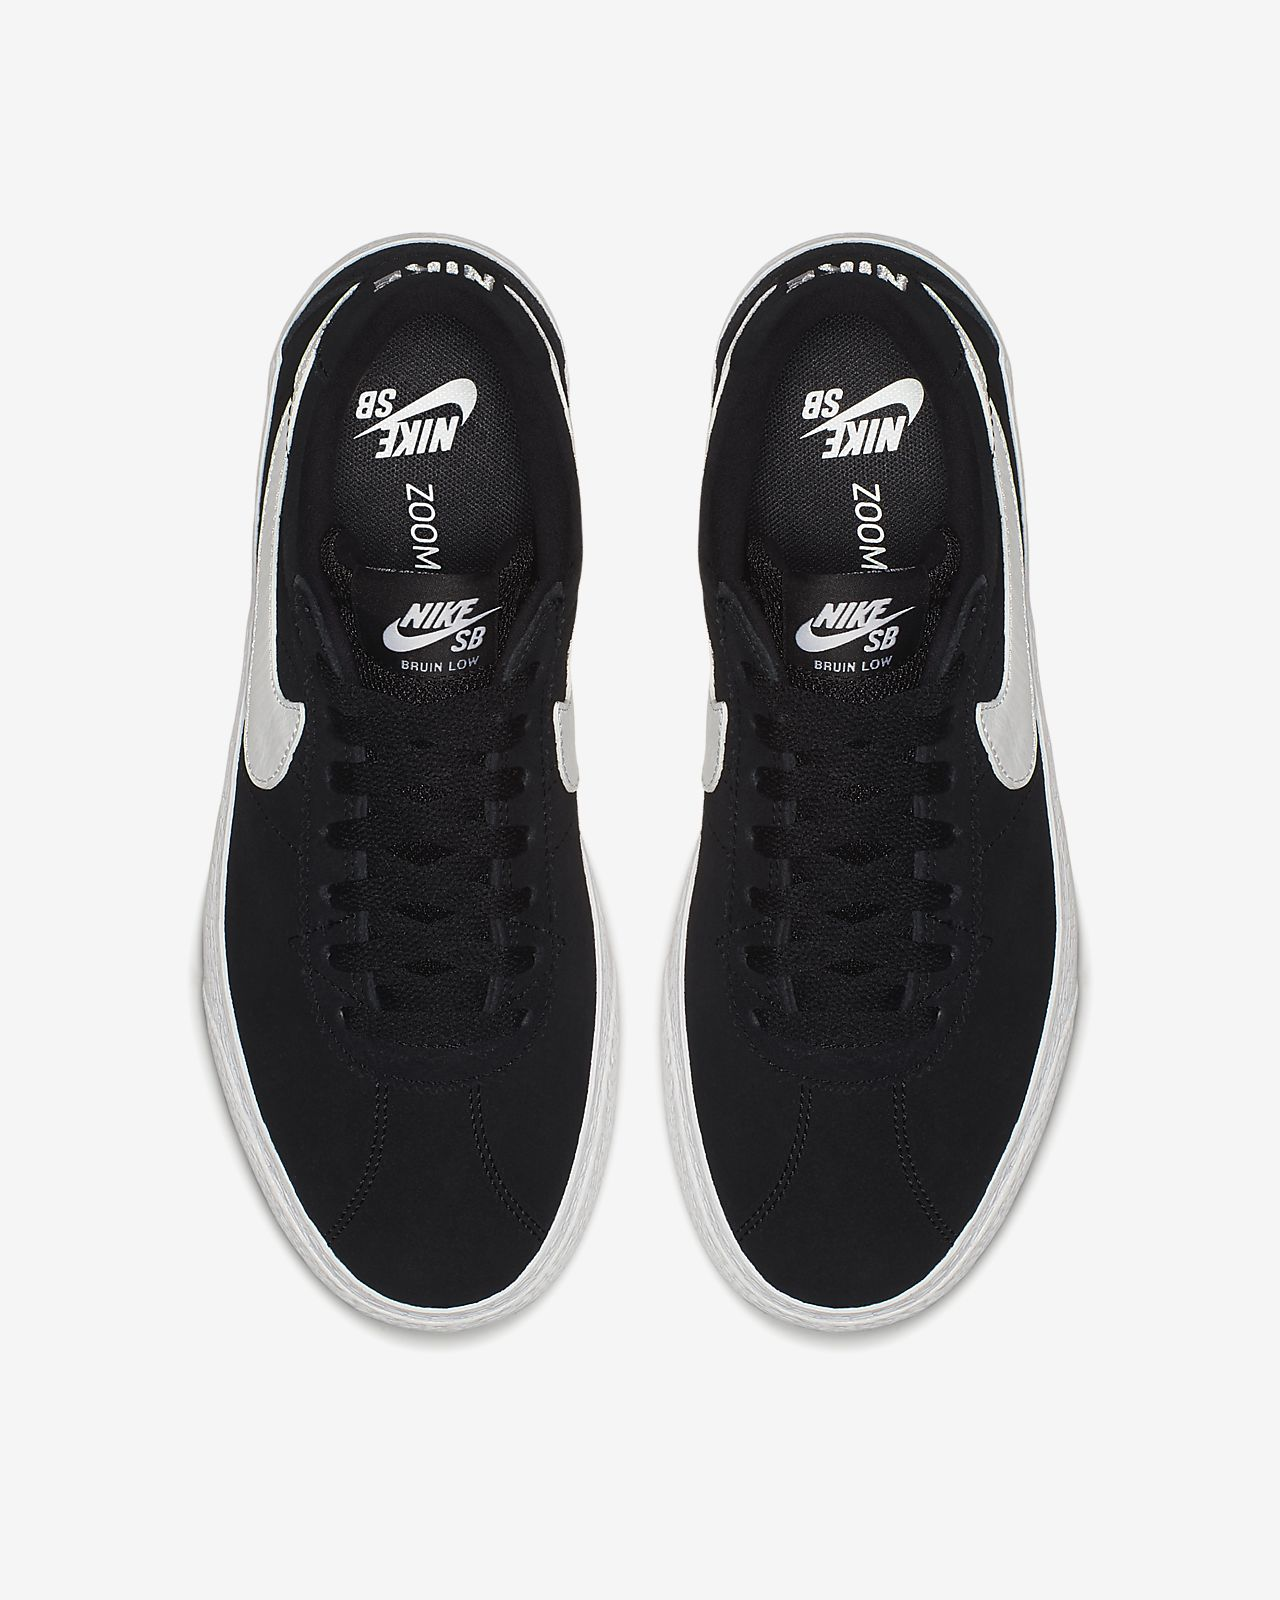 sale retailer 31e64 6b5a2 ... Nike SB Zoom Bruin Low Women s Skateboarding Shoe